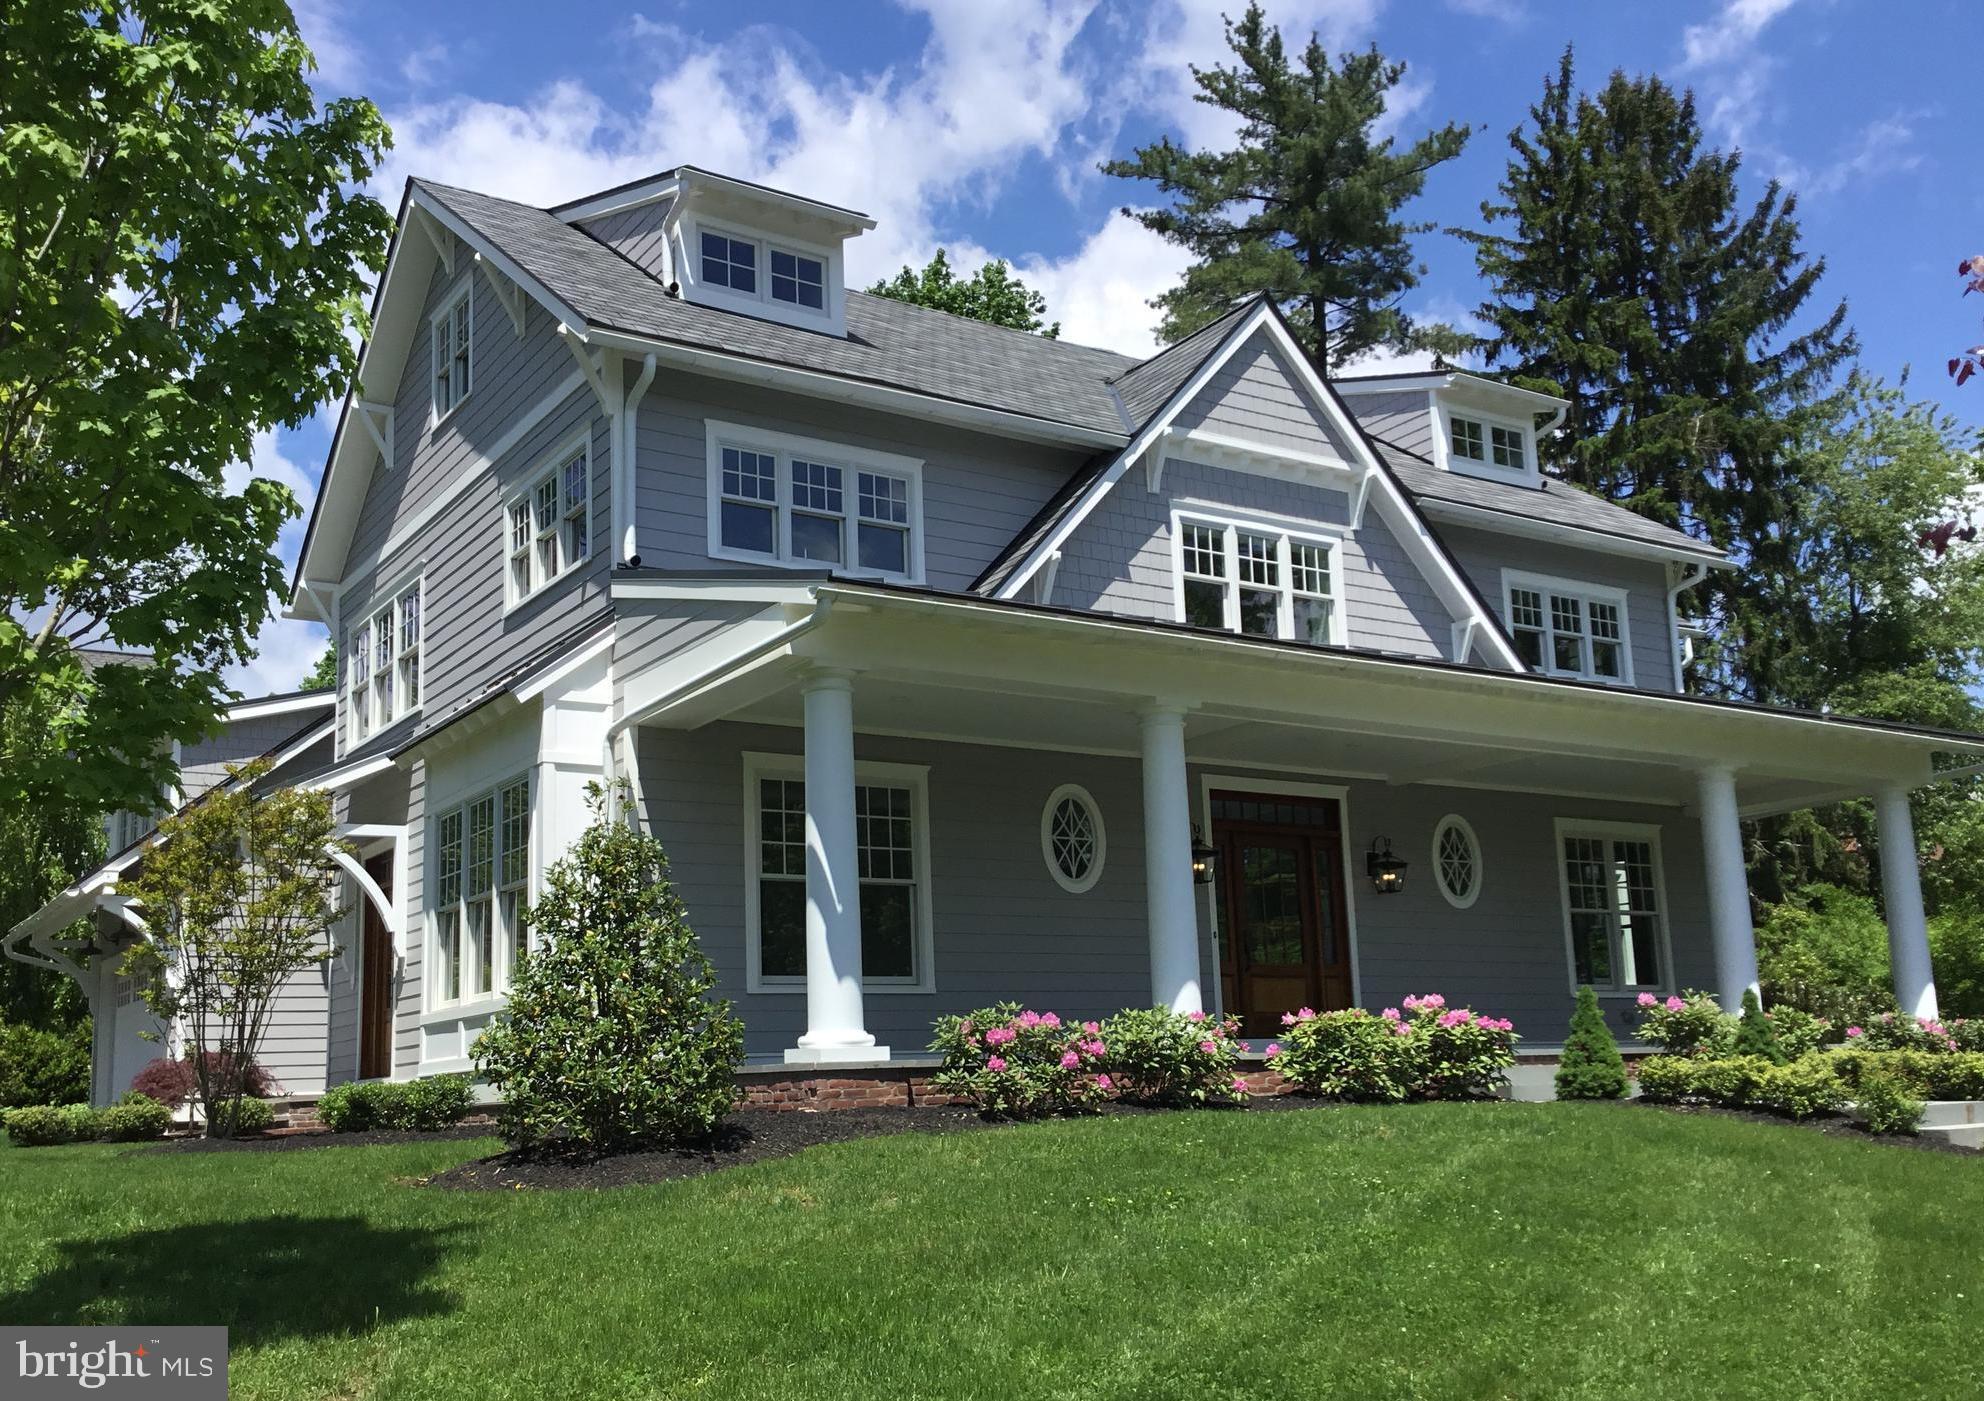 401 LINDEN AVENUE, DOYLESTOWN, PA 18901